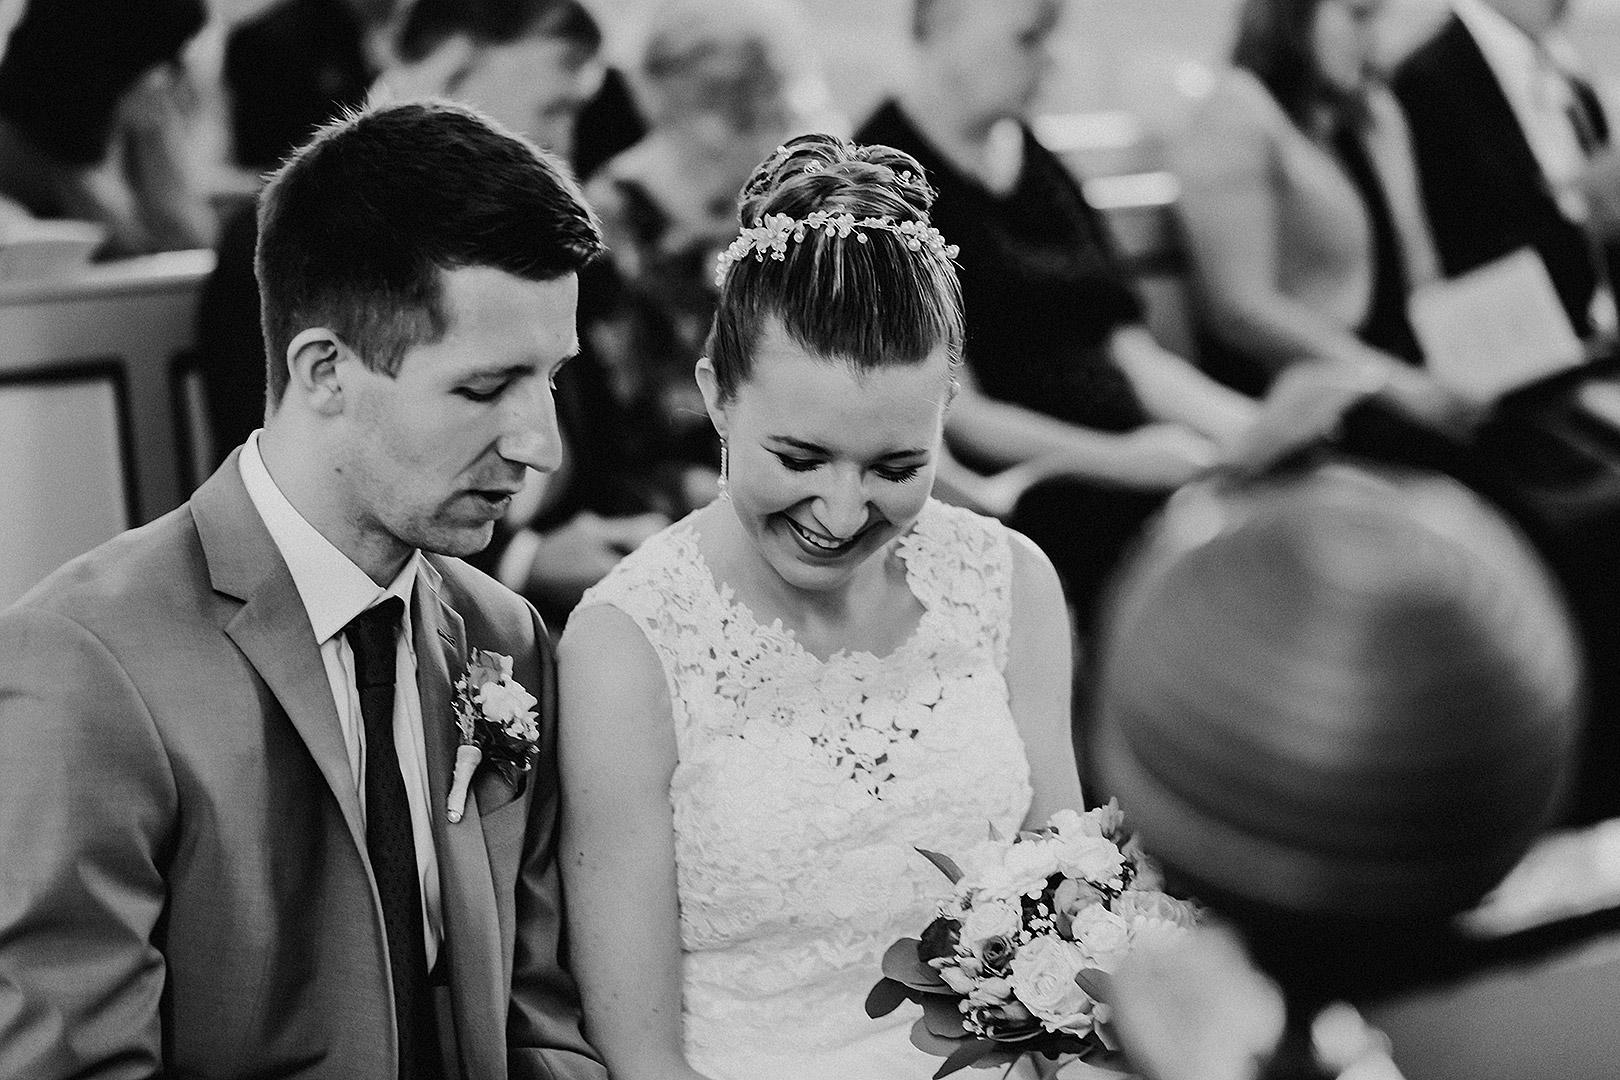 portrait_wedding_stefanieundsven_15